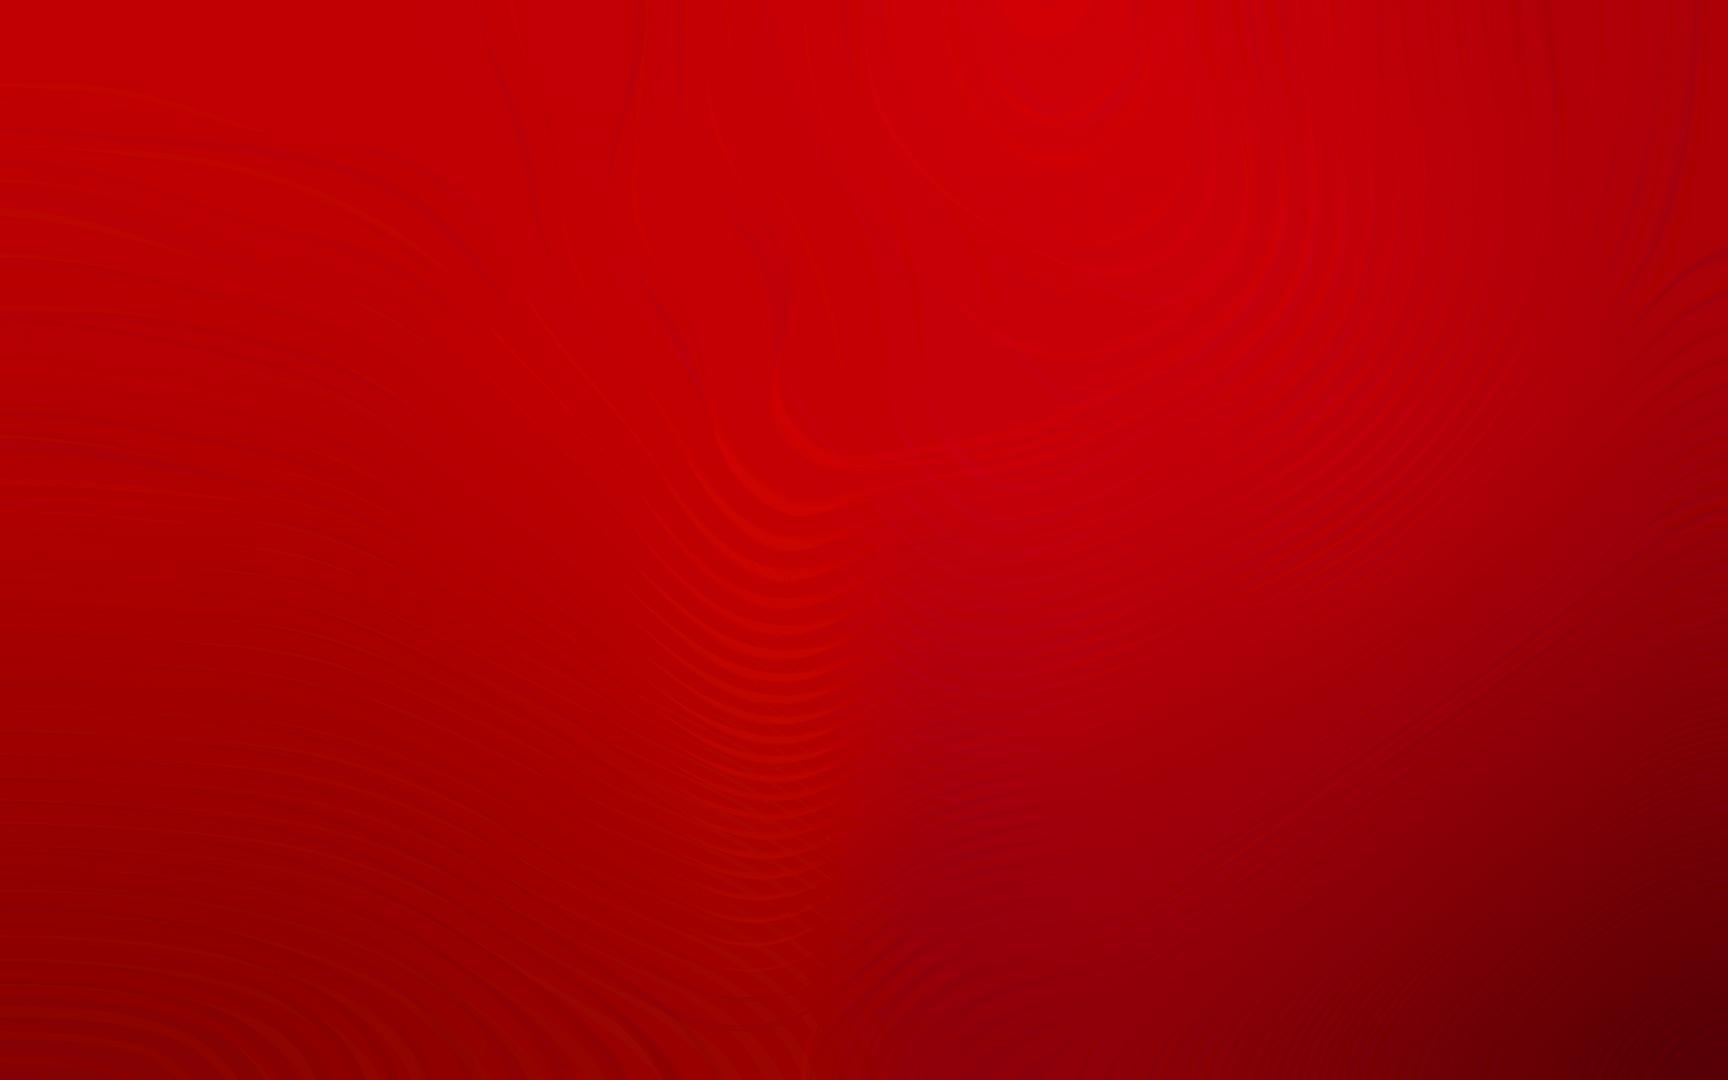 Snow Falling Wallpaper Hd Wallpaper Of Red 4684 Hdwpro